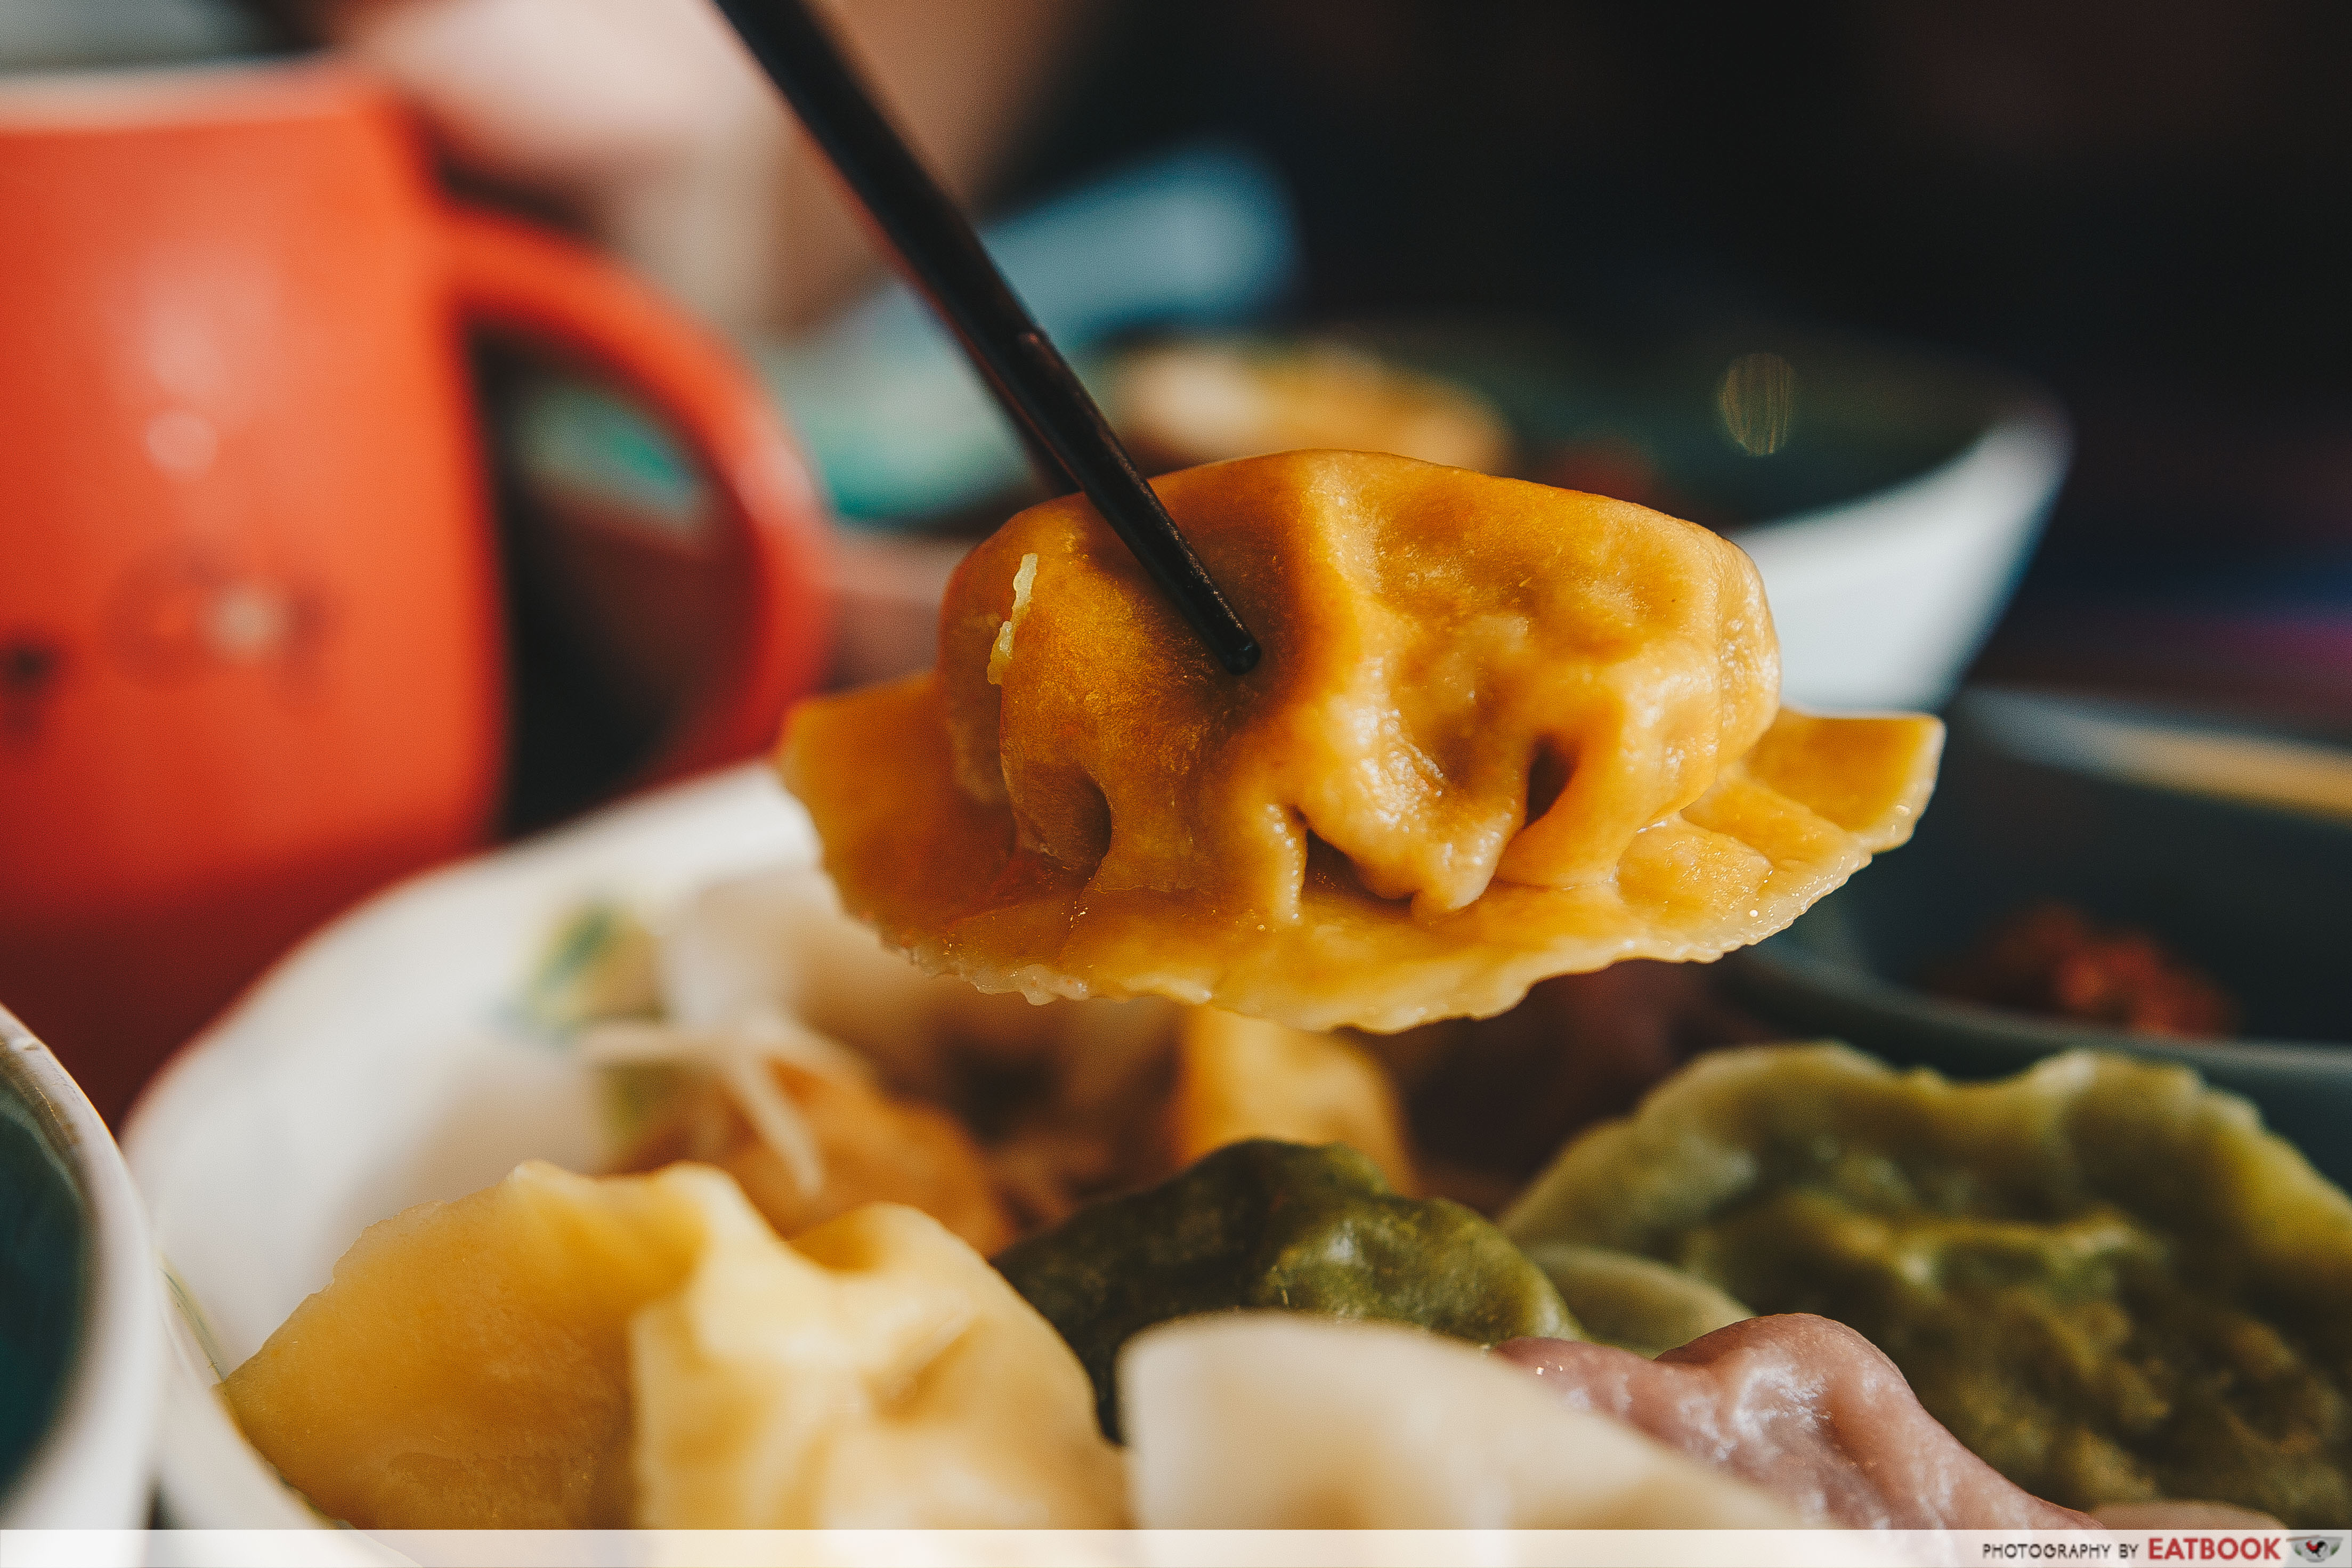 Dumplings Cafe - Orange Dumpling Whole